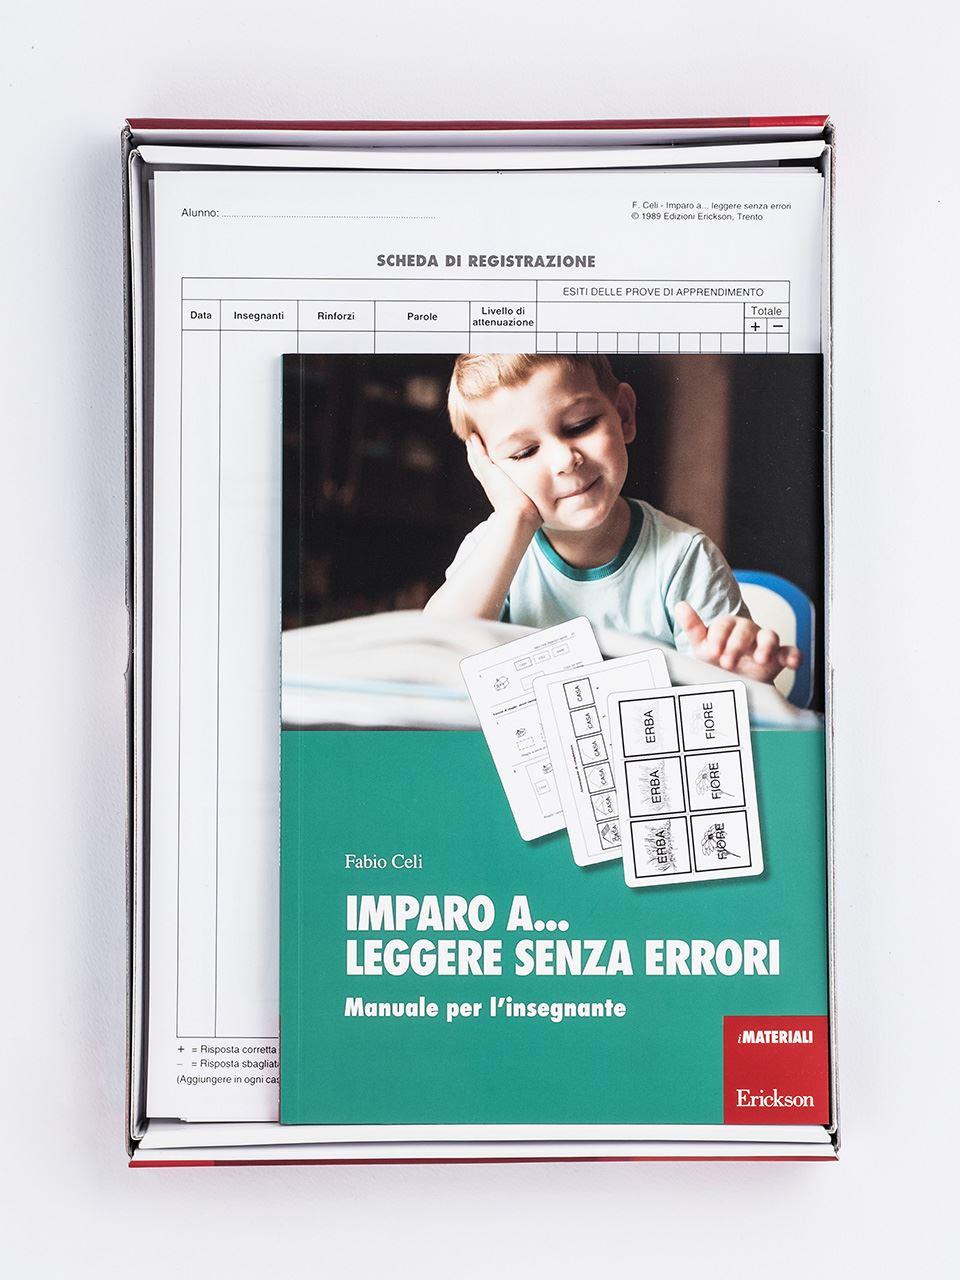 Imparo a... leggere senza errori - Libri - Erickson 2